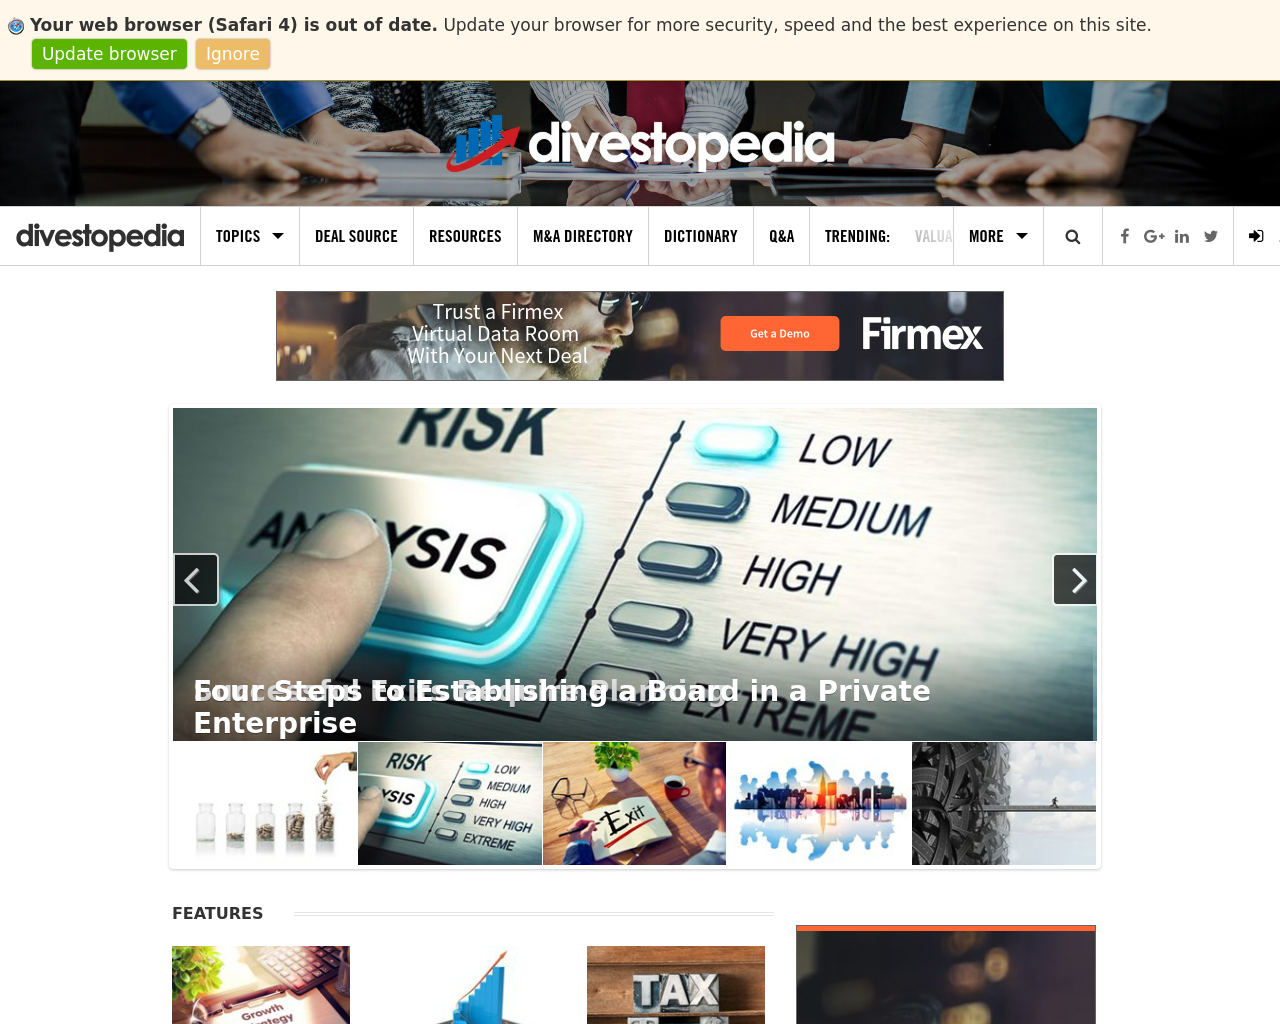 divestopedia-Advertising-Reviews-Pricing